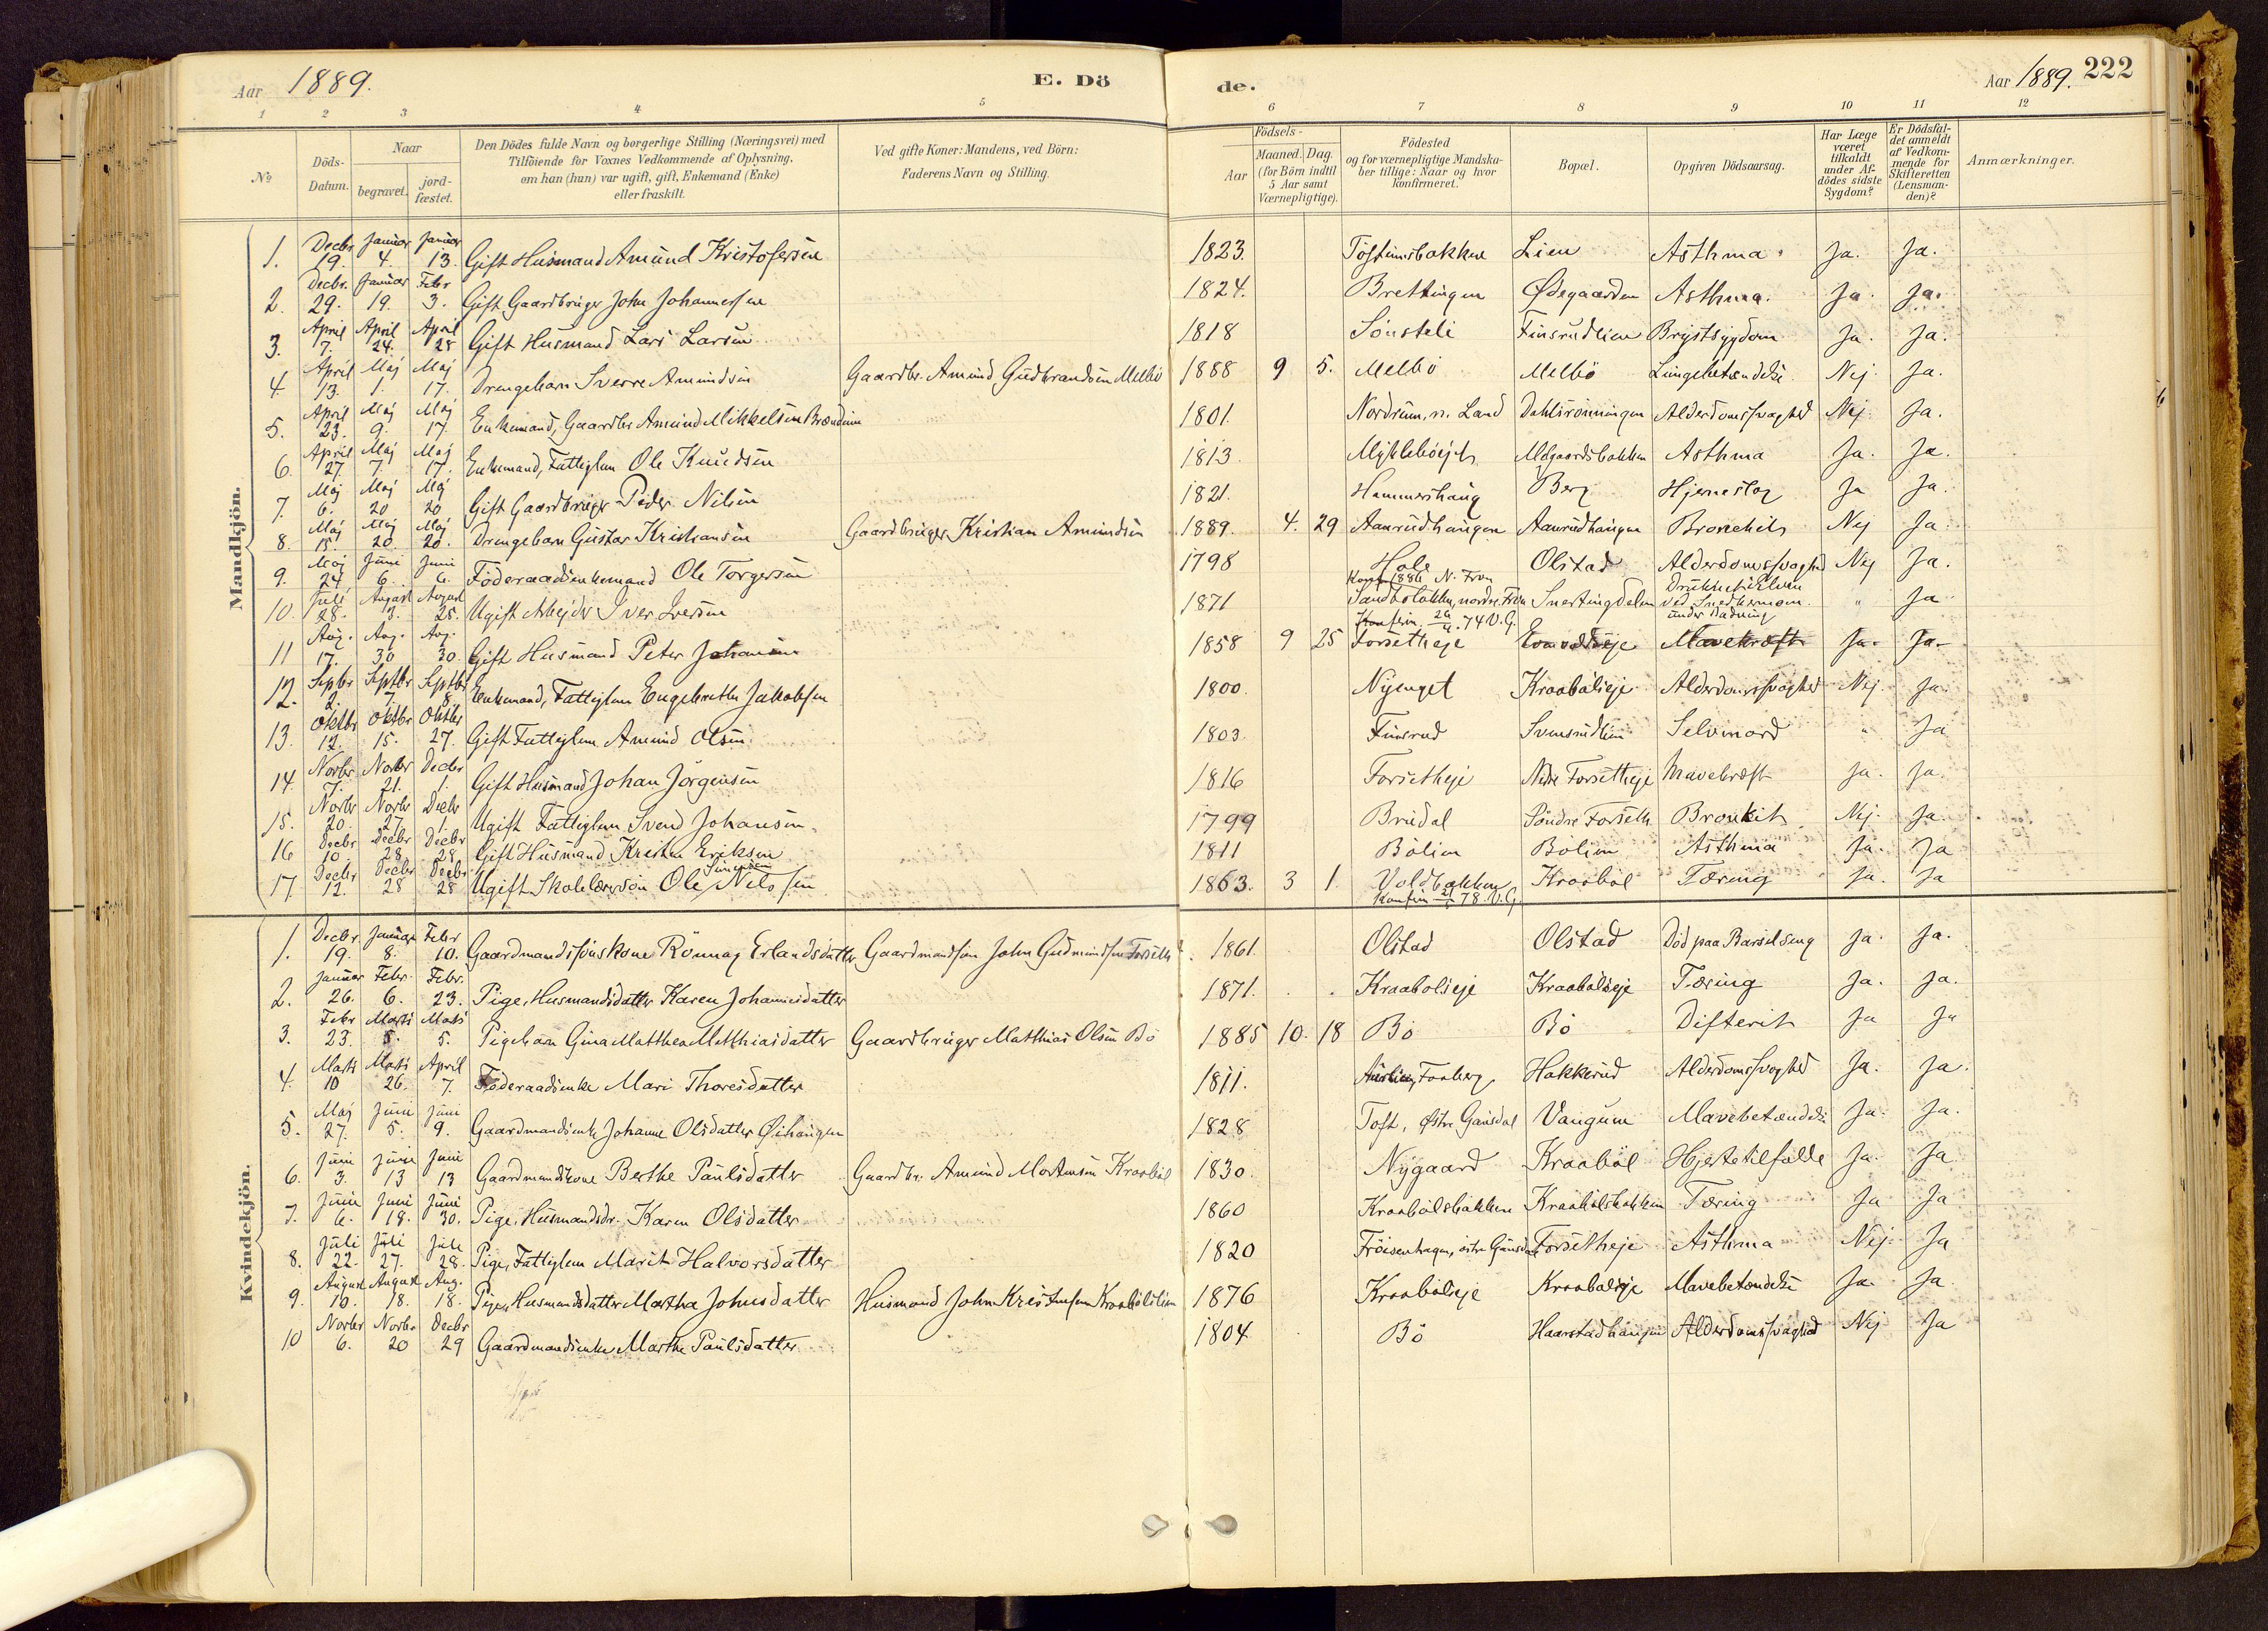 SAH, Vestre Gausdal prestekontor, Ministerialbok nr. 1, 1887-1914, s. 222